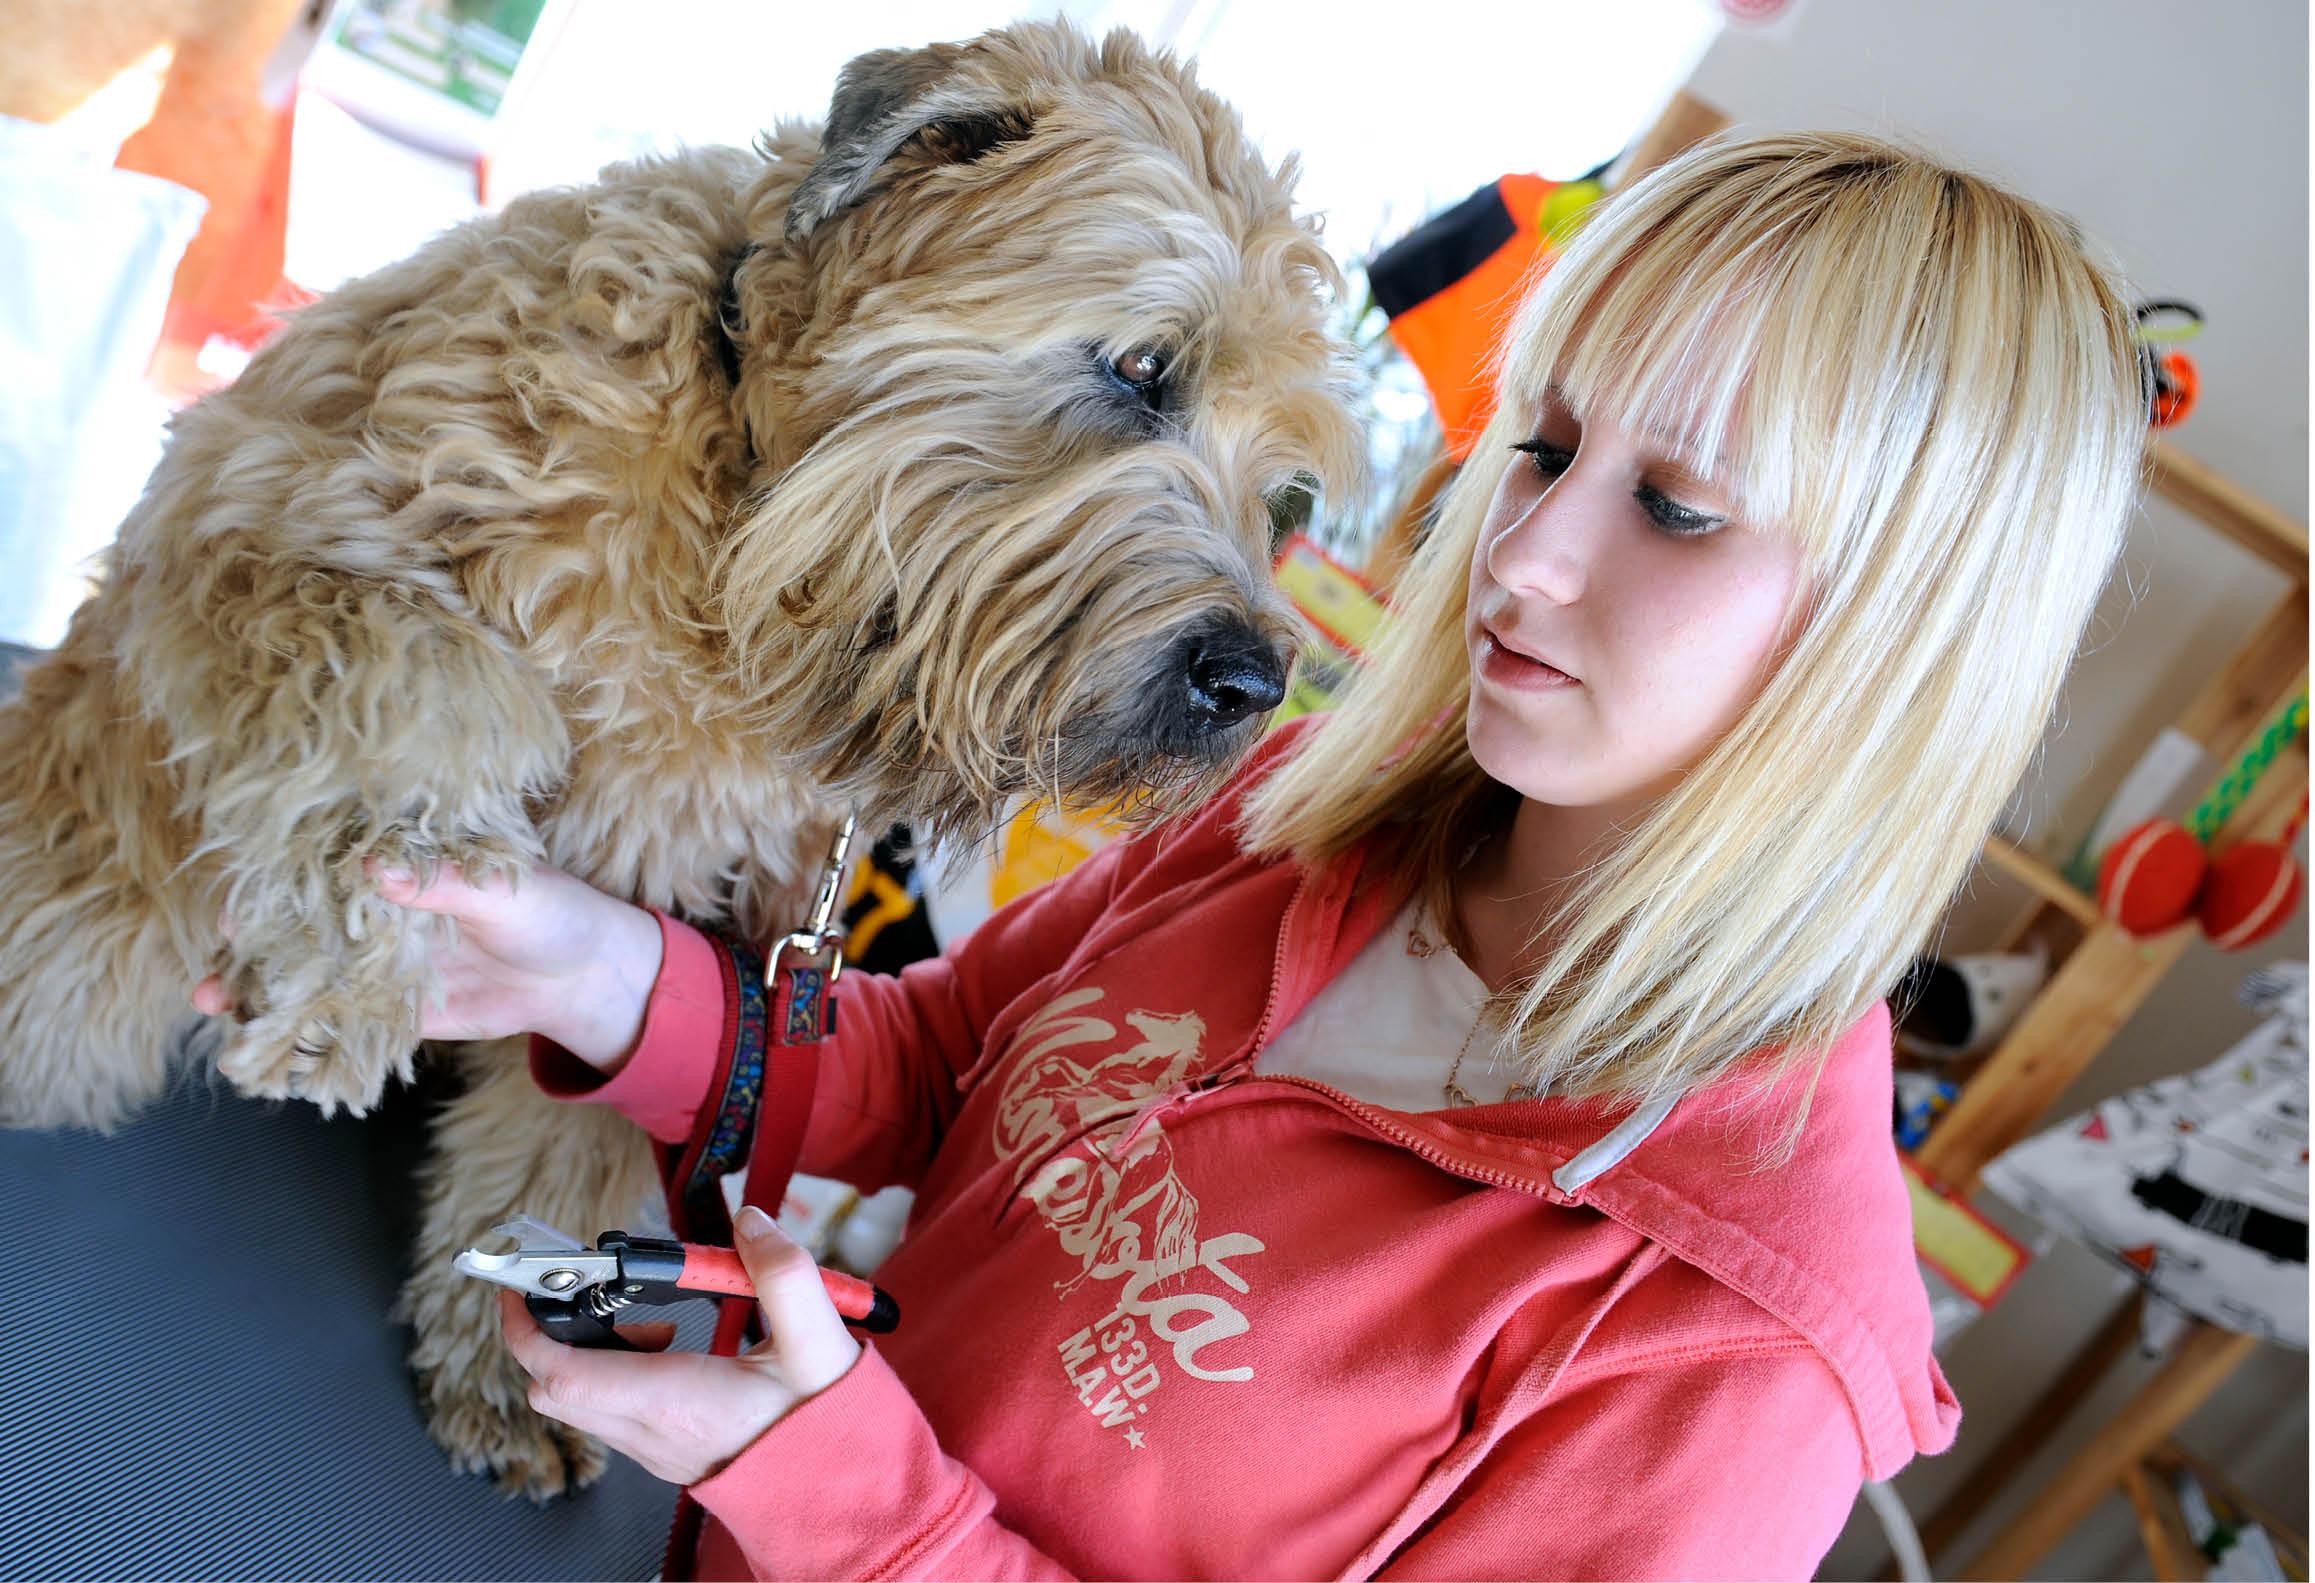 Hundskötare som klipper klorna på en hund